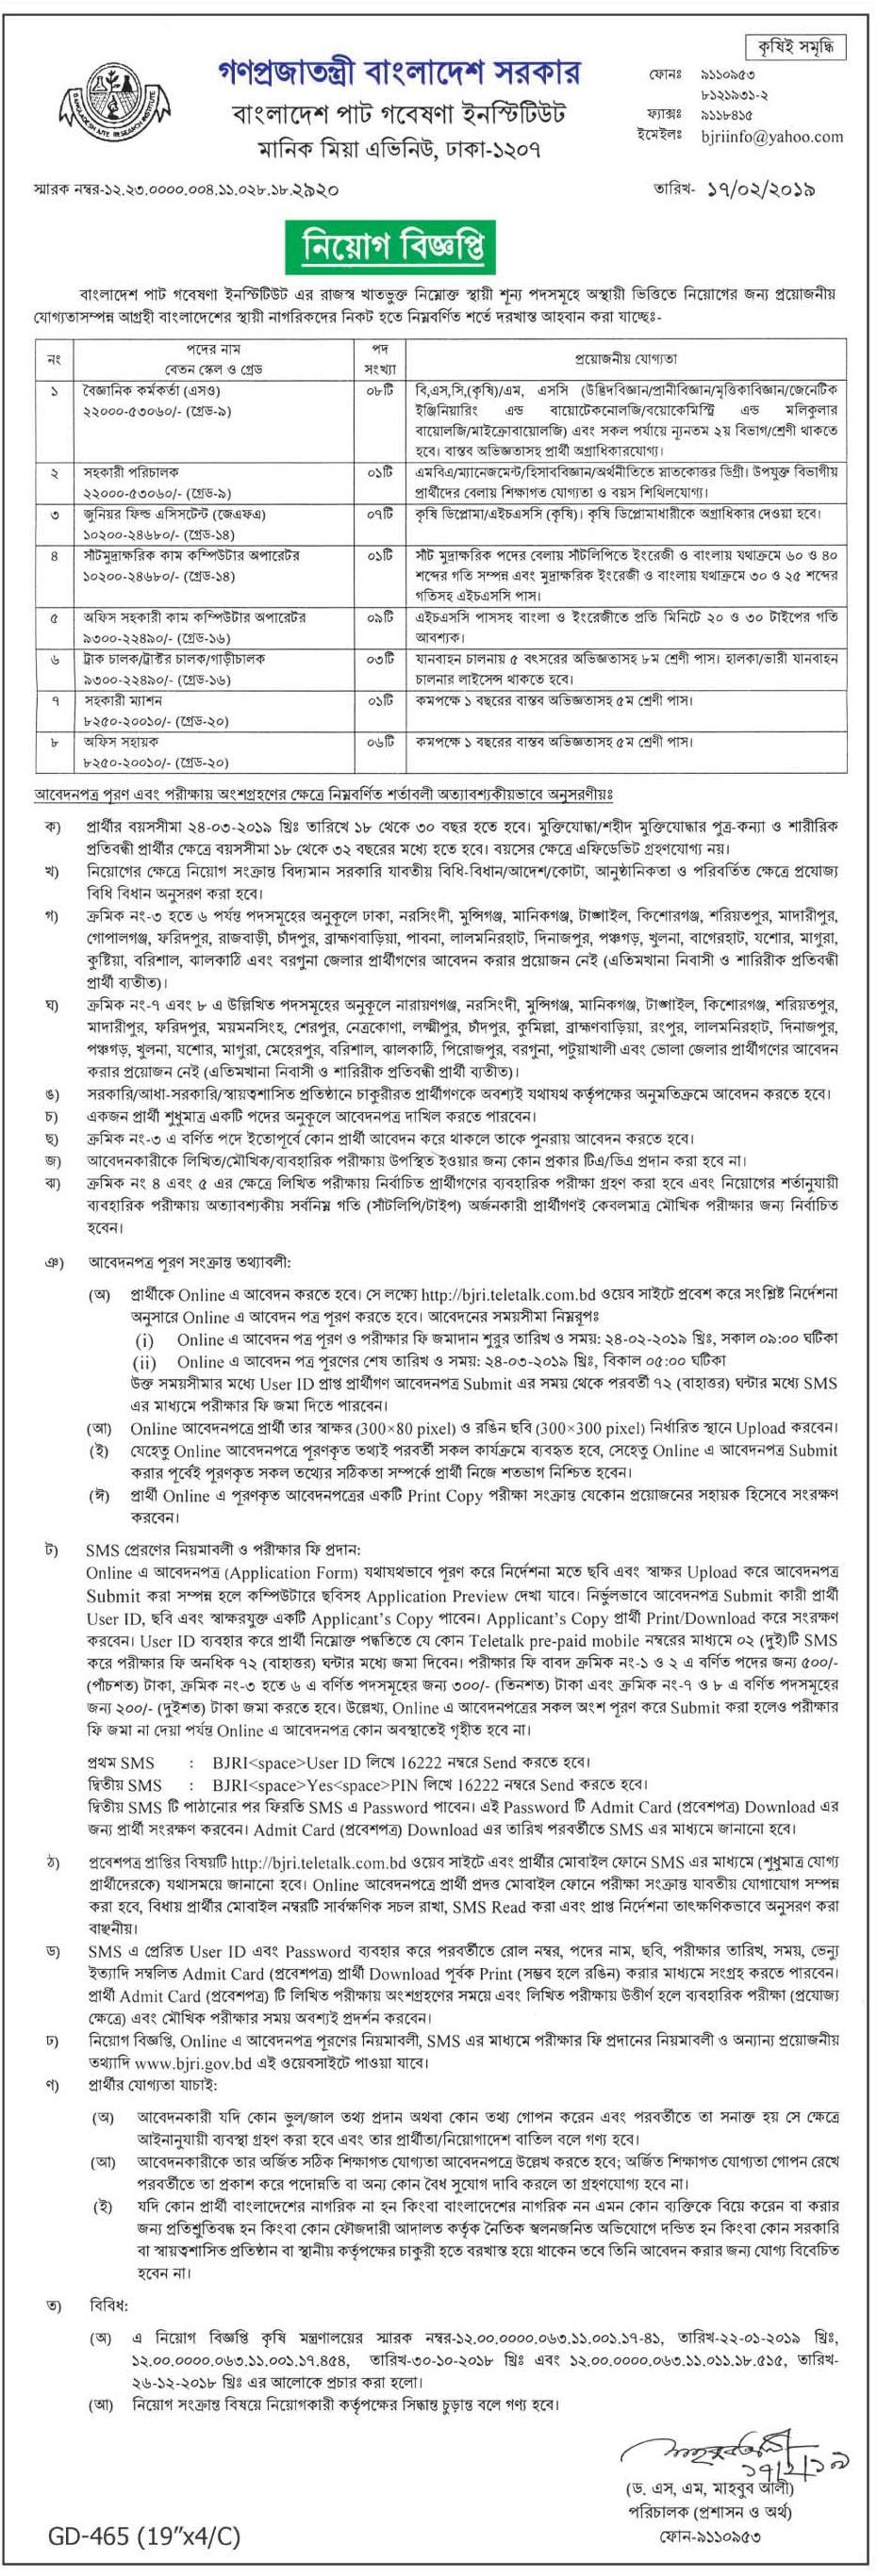 Bangladesh Jute Research Institute Job Circular 2018, Pat Gobeshona Institute Job Circular, BJRI Recruitment, পাট গবেষণা ইনস্টিটিউট নিয়োগ বিজ্ঞপ্তি ২০১৯, সরকারি চাকরি, Govt. Job, http://bjri.teletalk.com.bd, bjri.gov.bd.